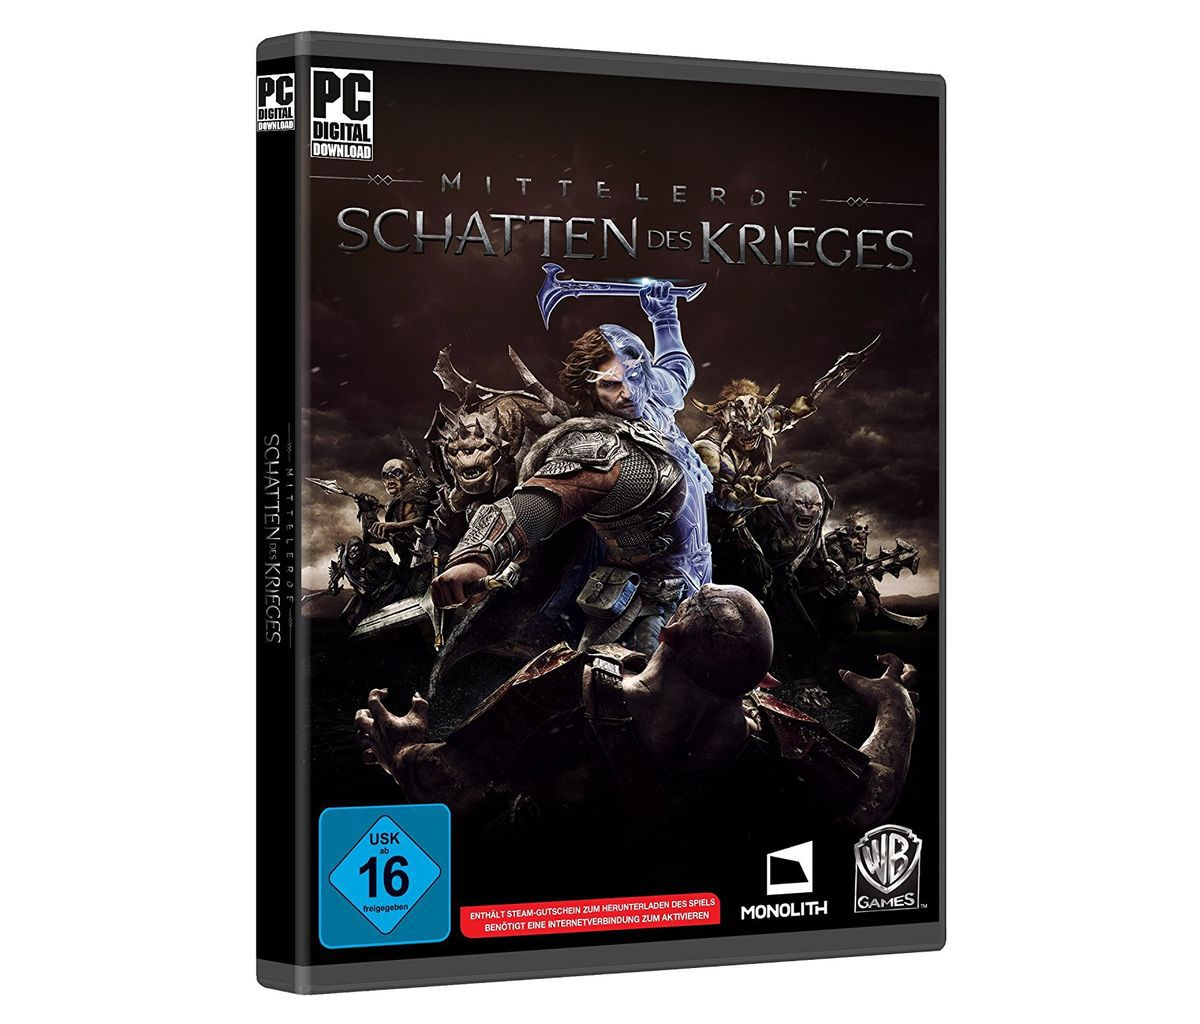 Warner Games PC - Spiel »Mittelerde: Schatten d...